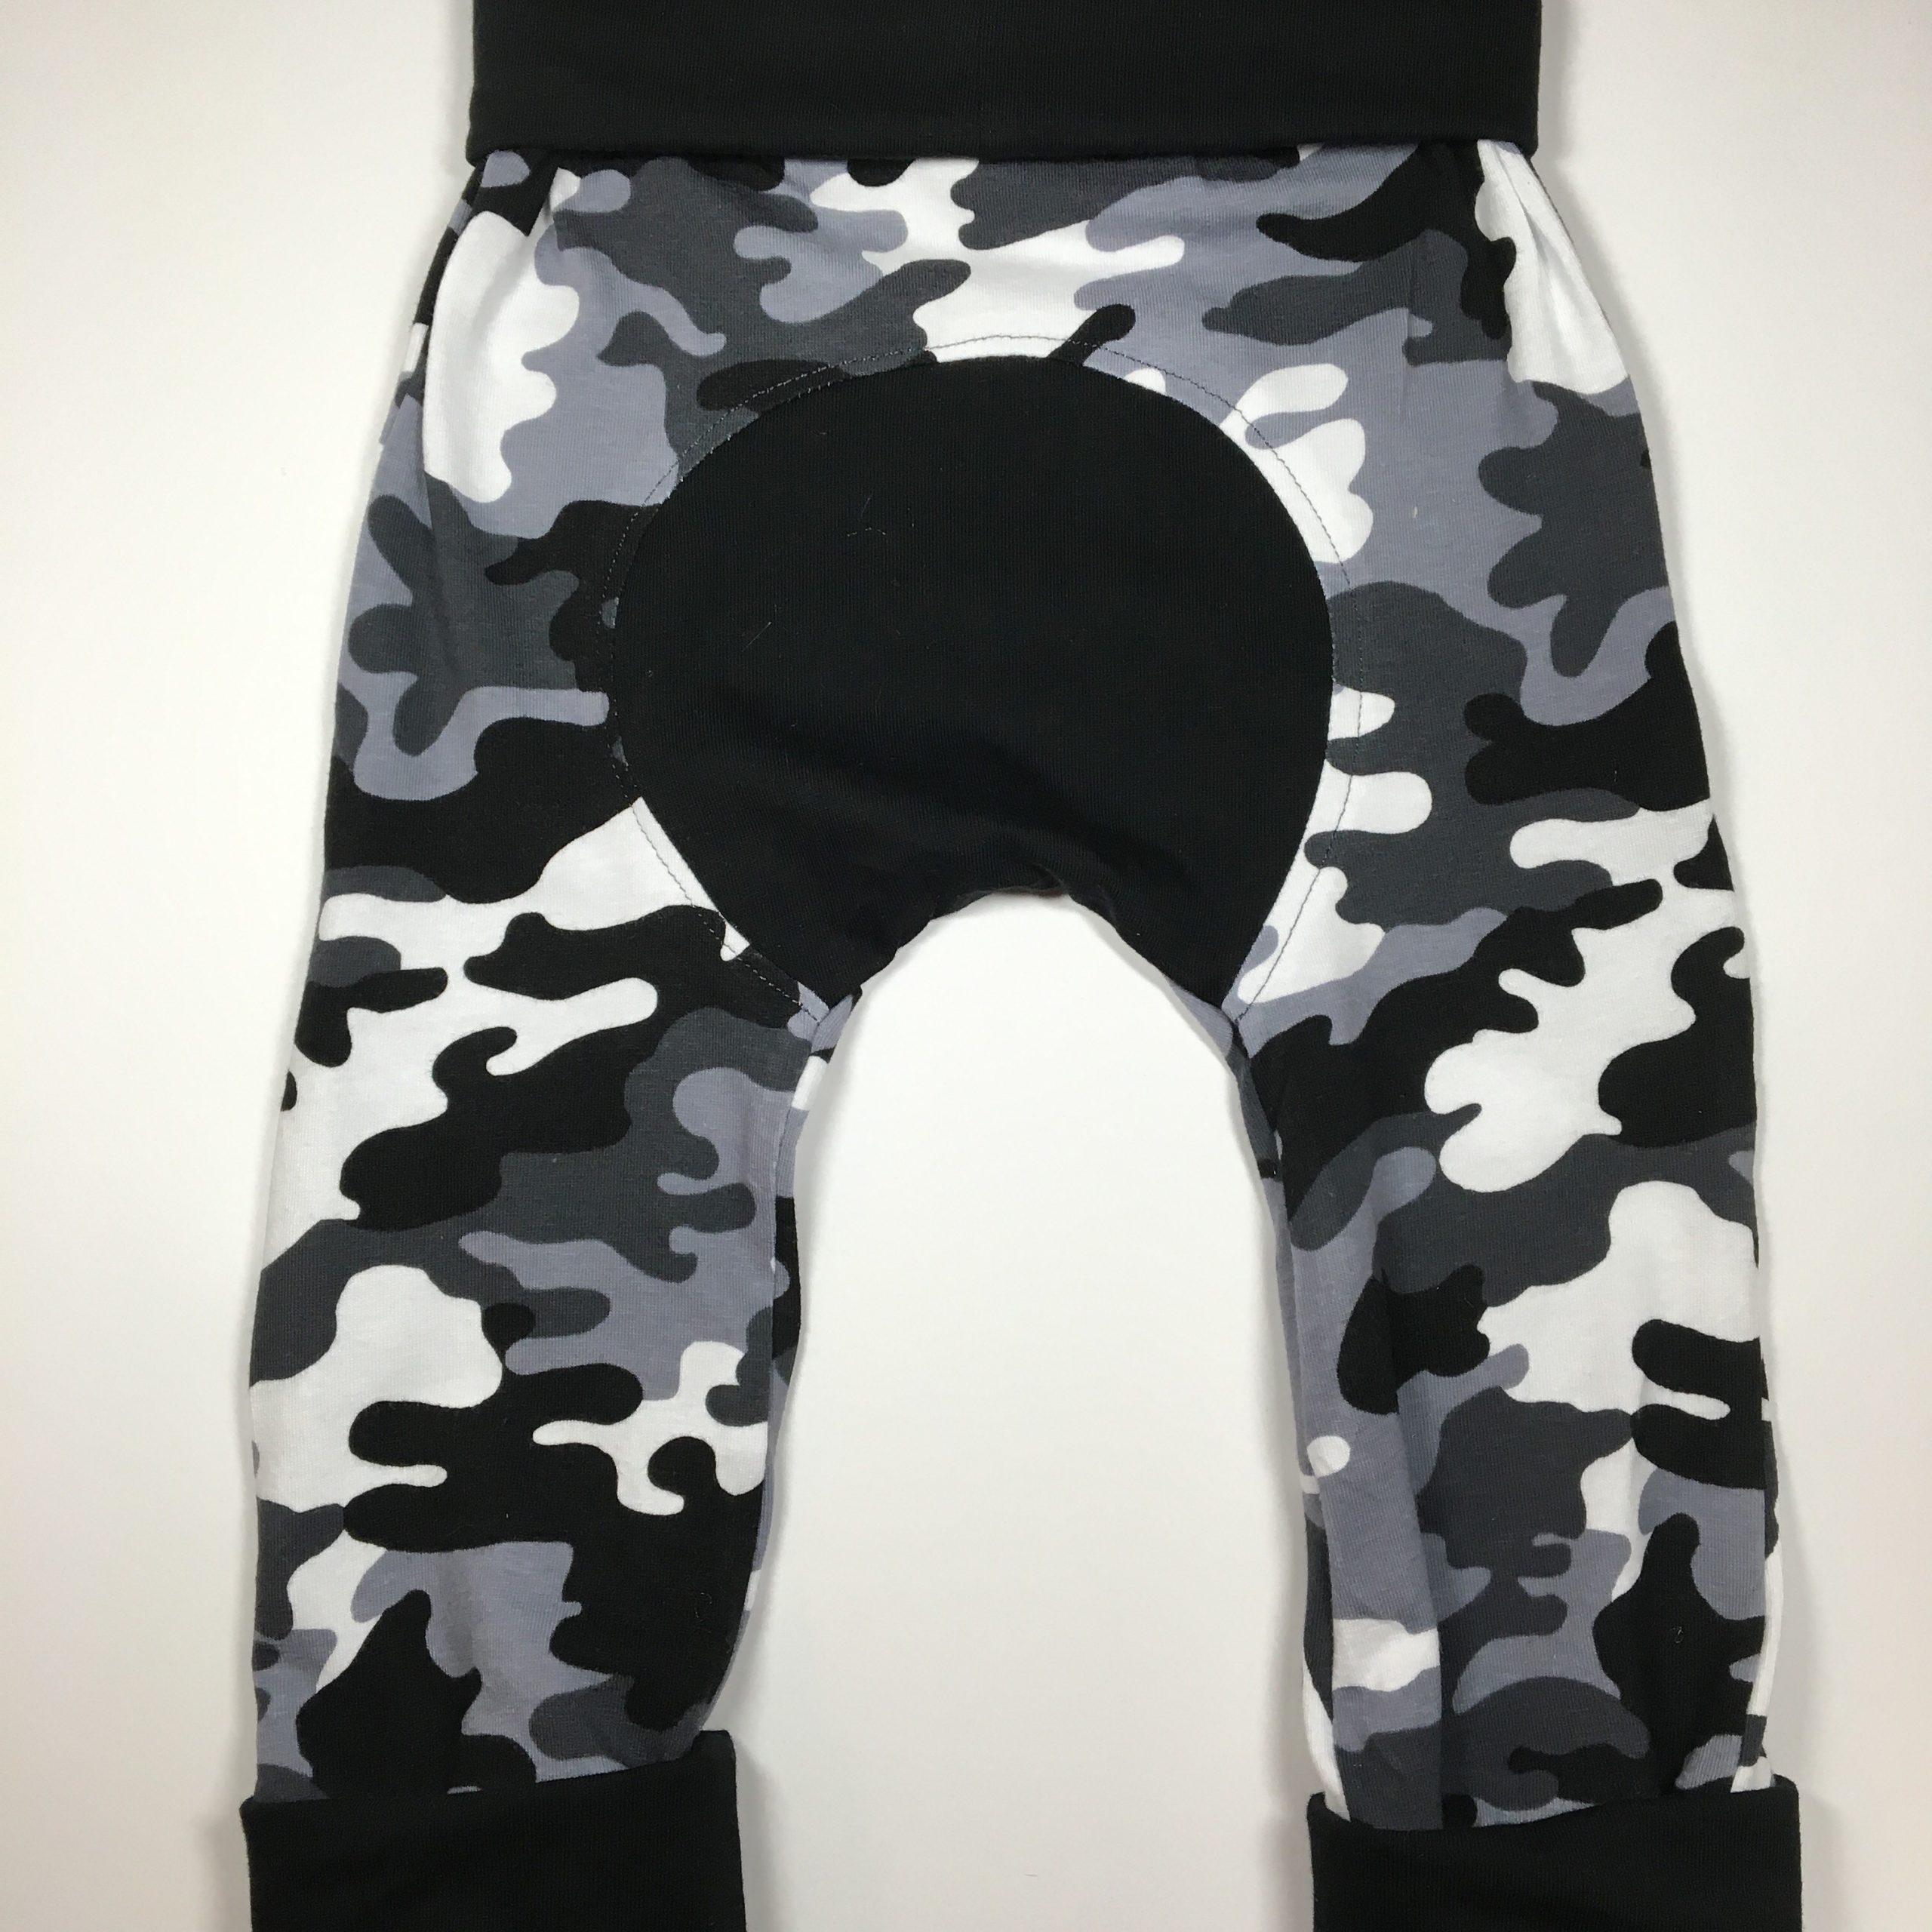 Black camo camouflage grow along pants adjustable fit